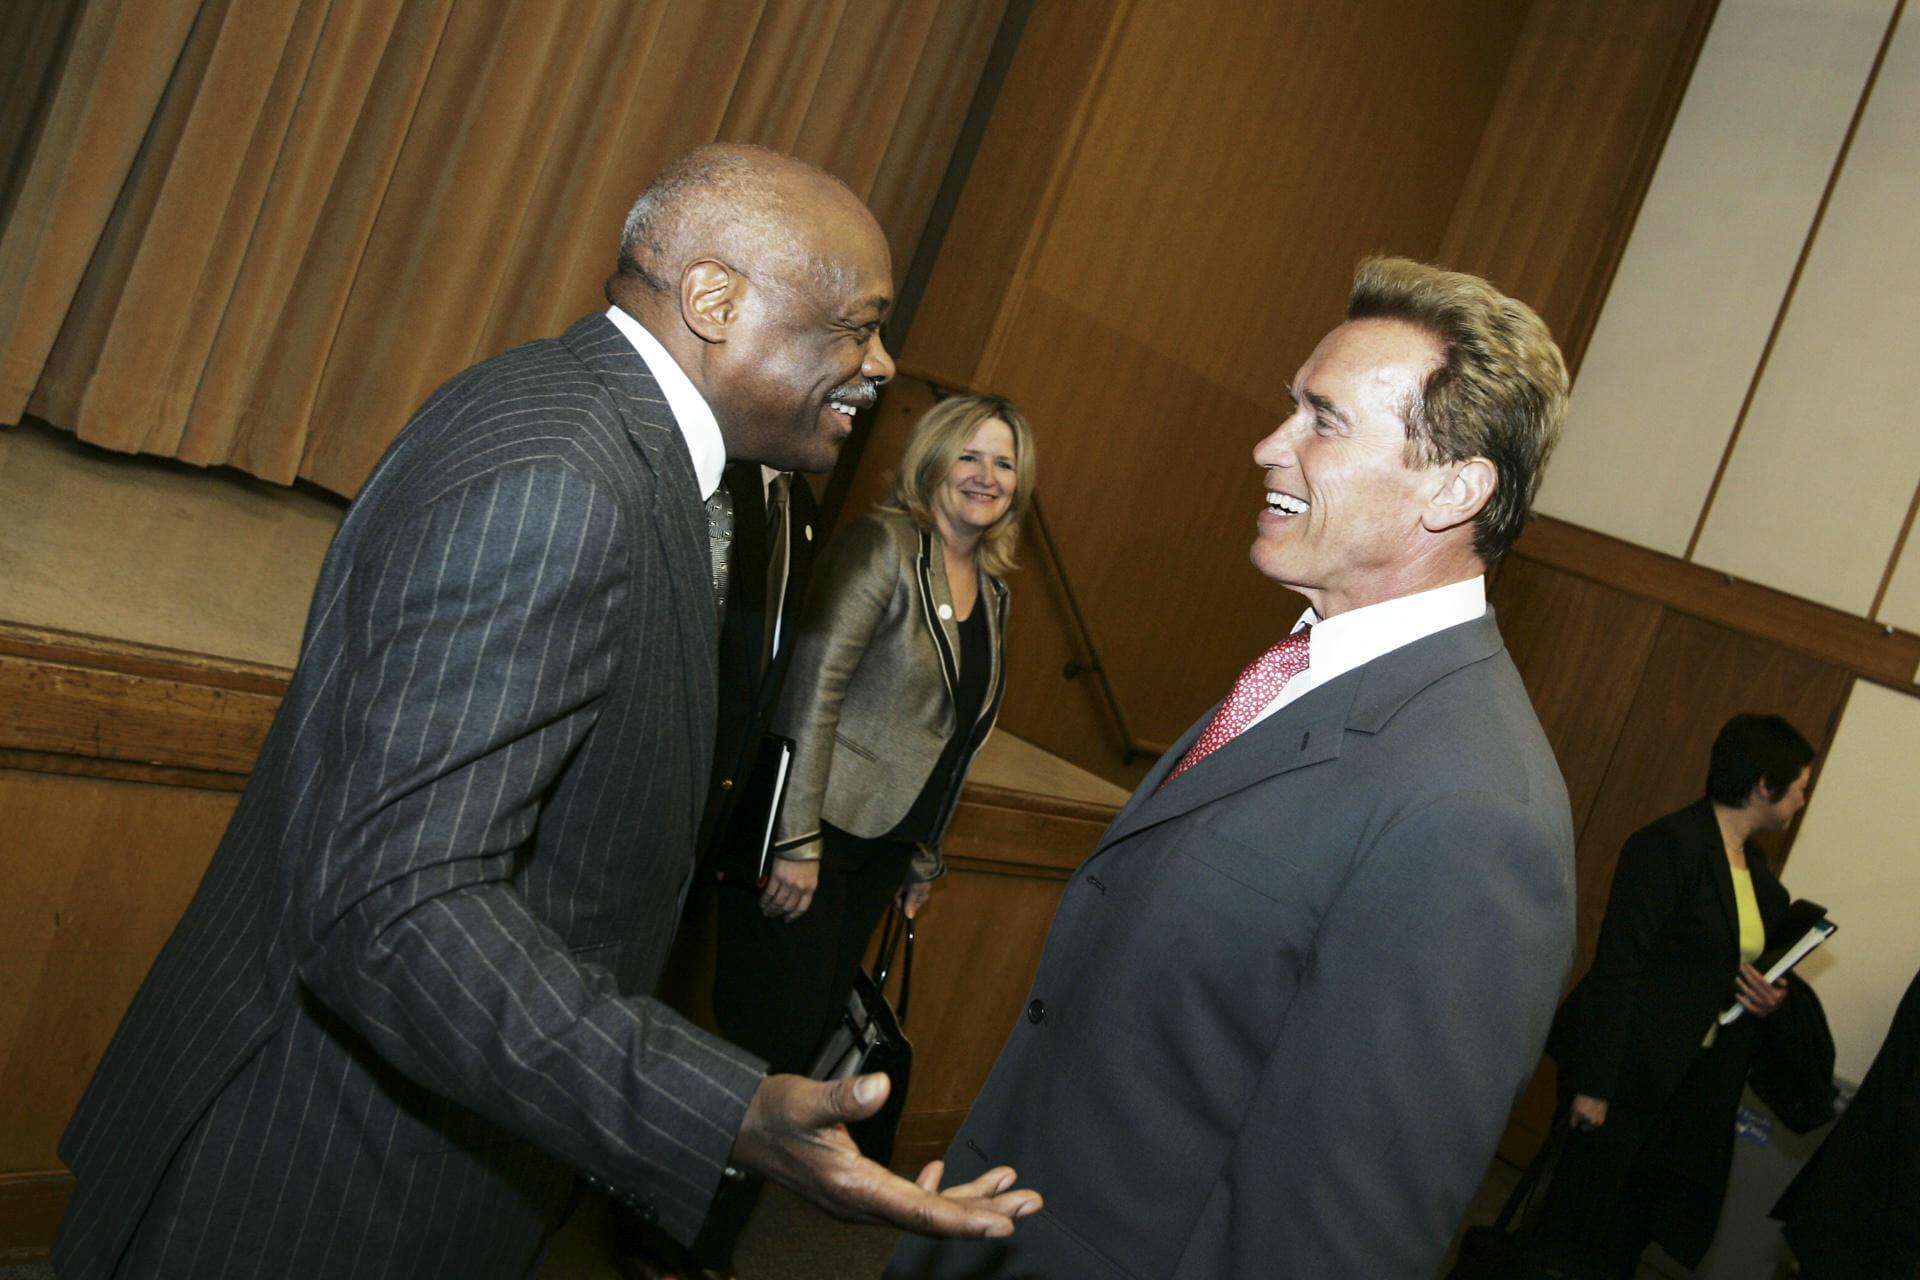 Governor Arnold Schwarzenegger with former San Francisco Mayor Willie Brown